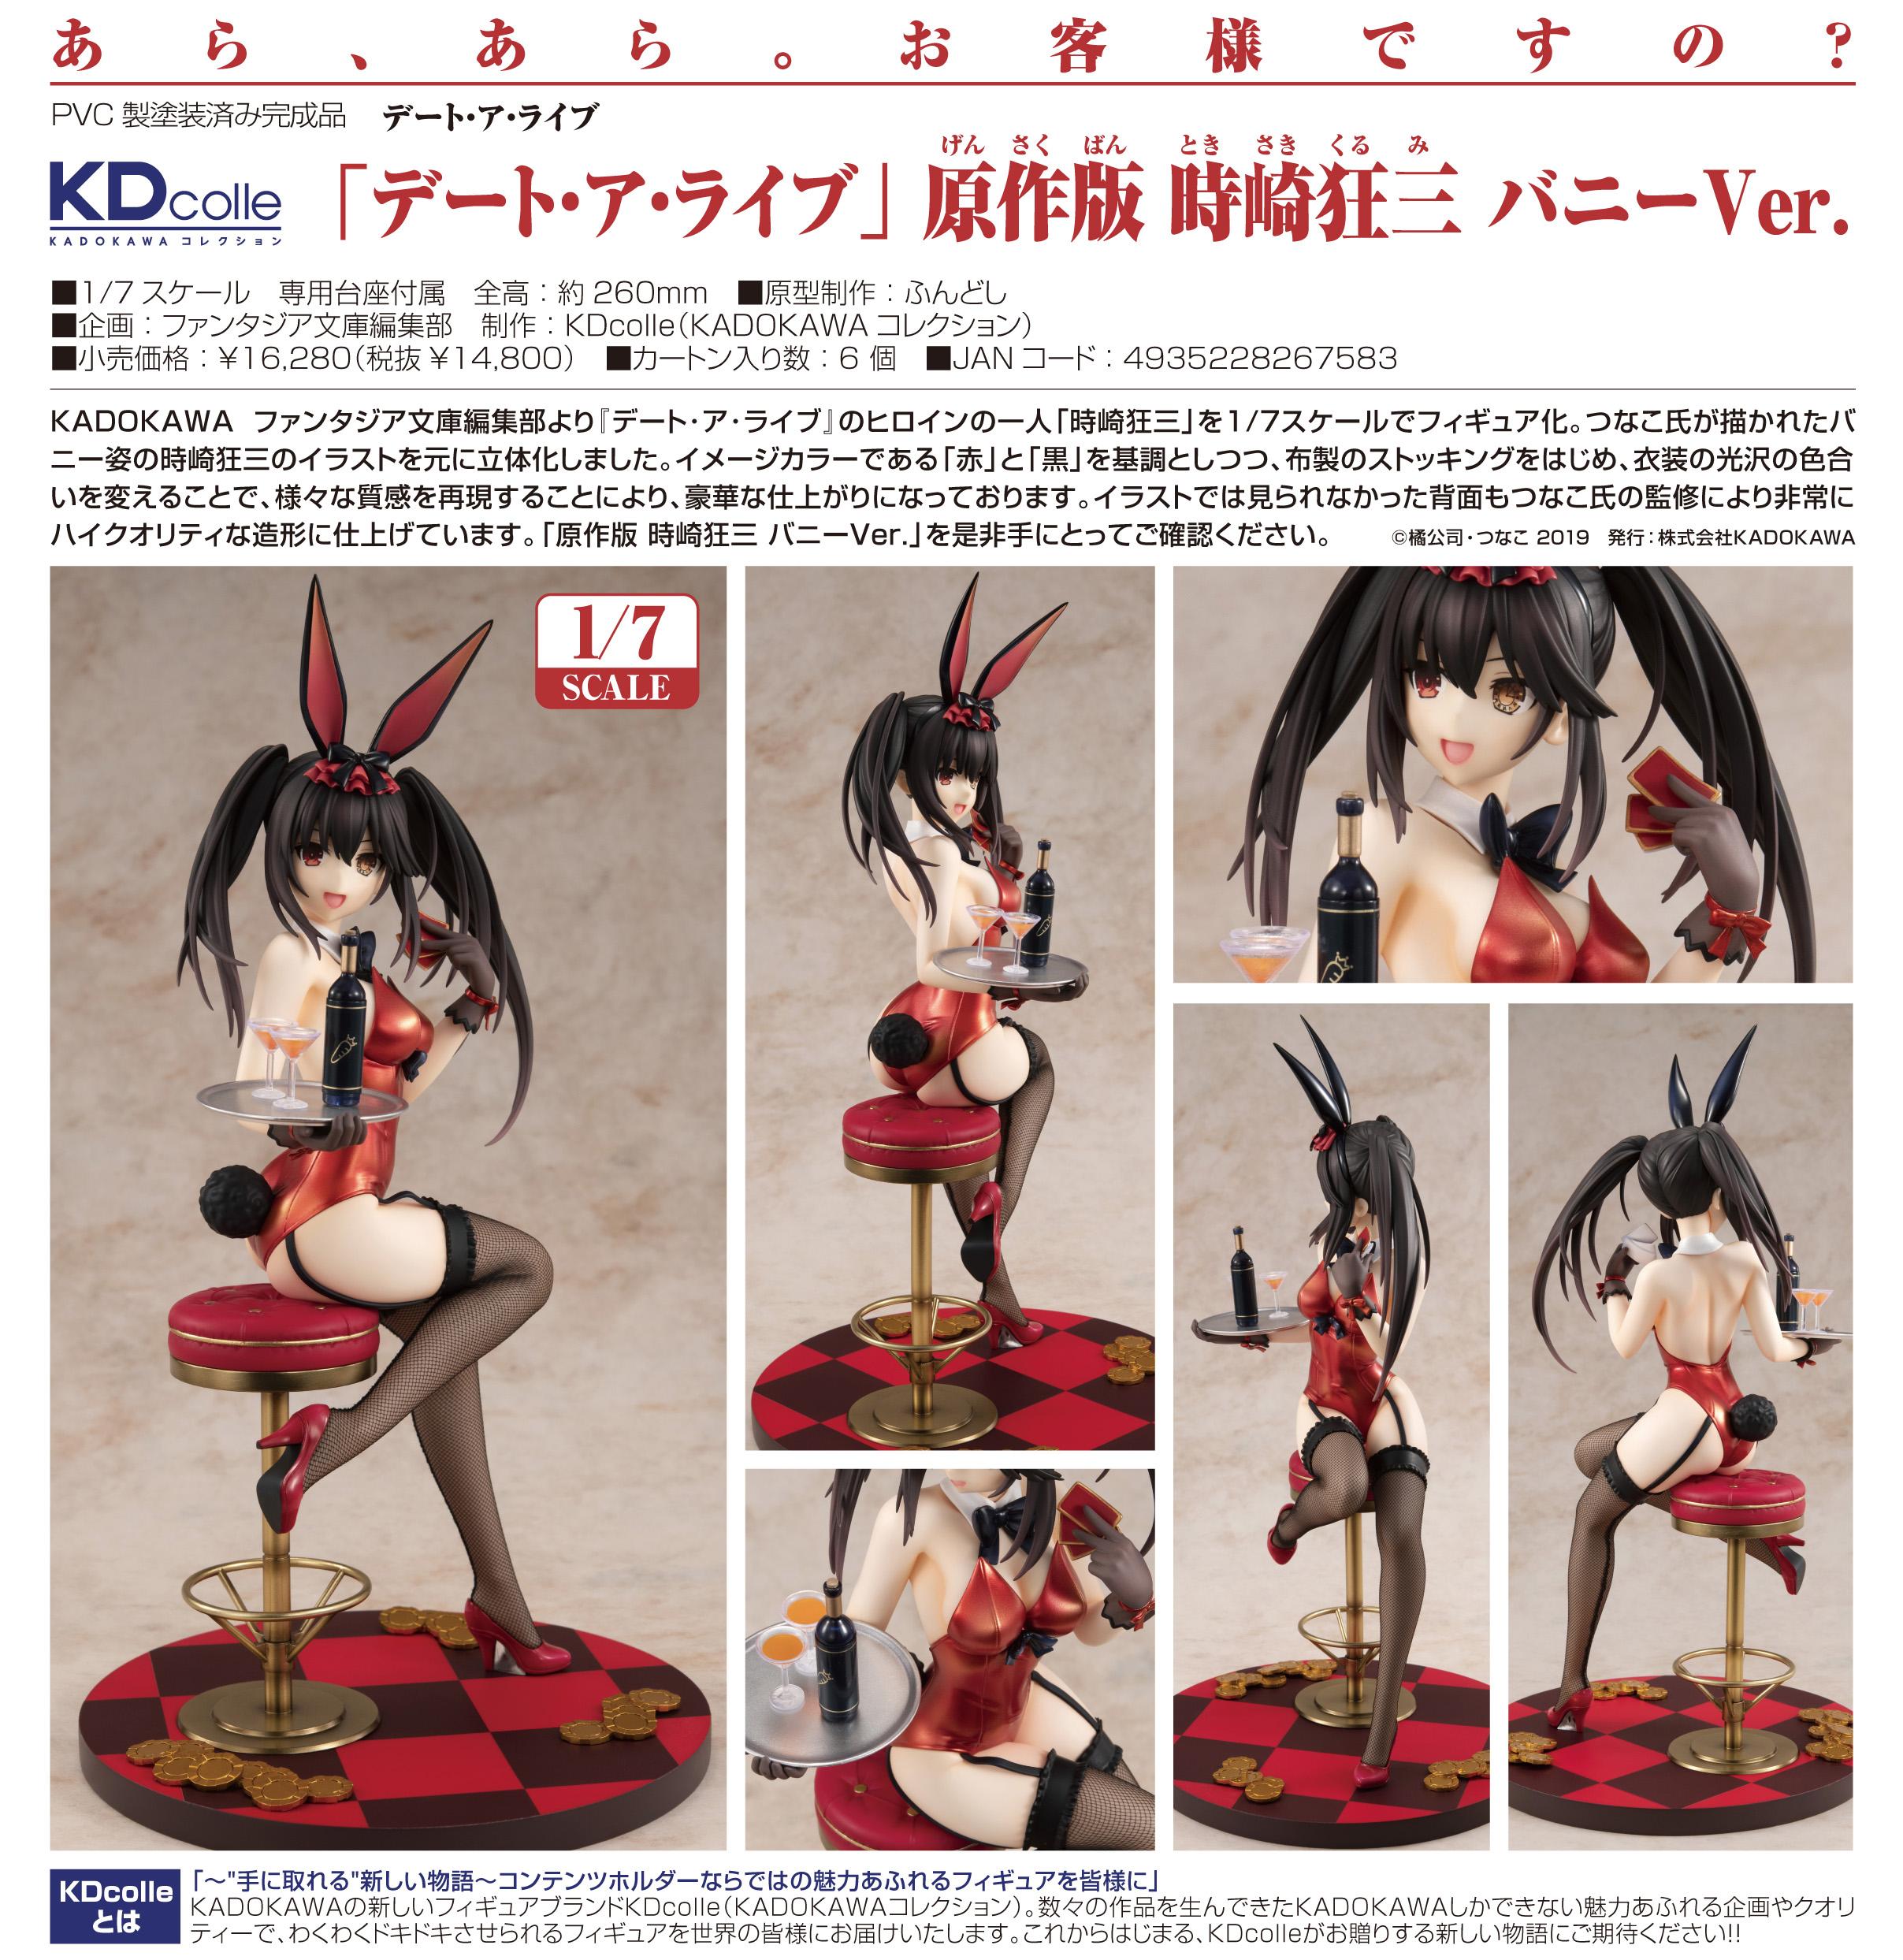 約會大作戰 KDcolle 1/7「時崎狂三」Bunny KDcolle 1/7 Original Edition Tokisaki Kurumi Bunny Ver.【Date A Live】